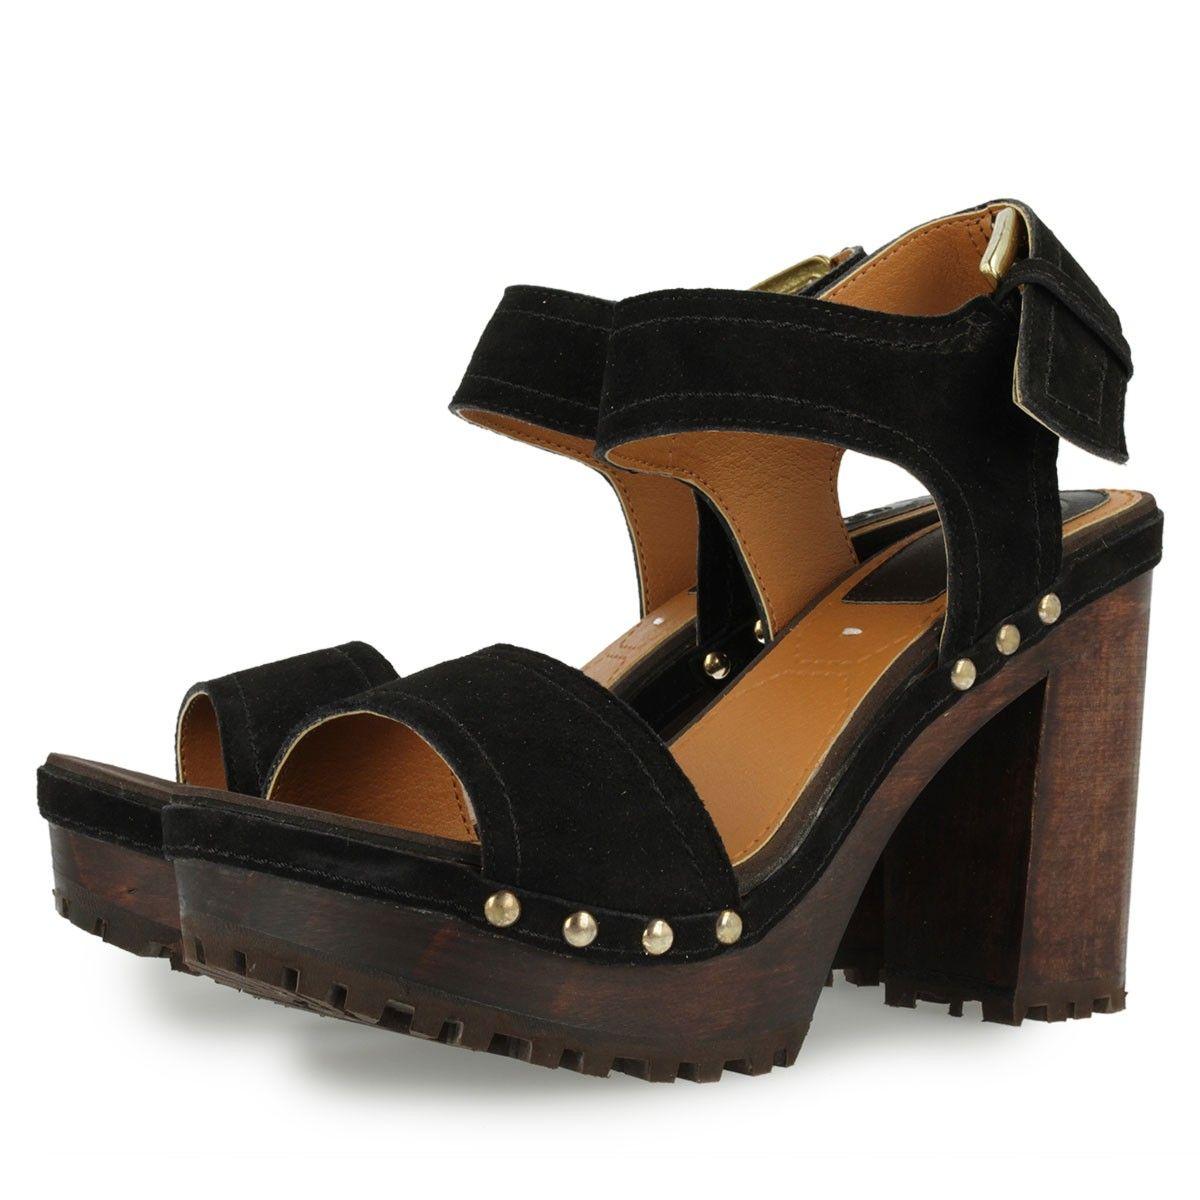 Gioseppo - Sandalias de piel Kirsten negro -Altura tacón: 12 cm Estilo de moda de descuento 28GSup4